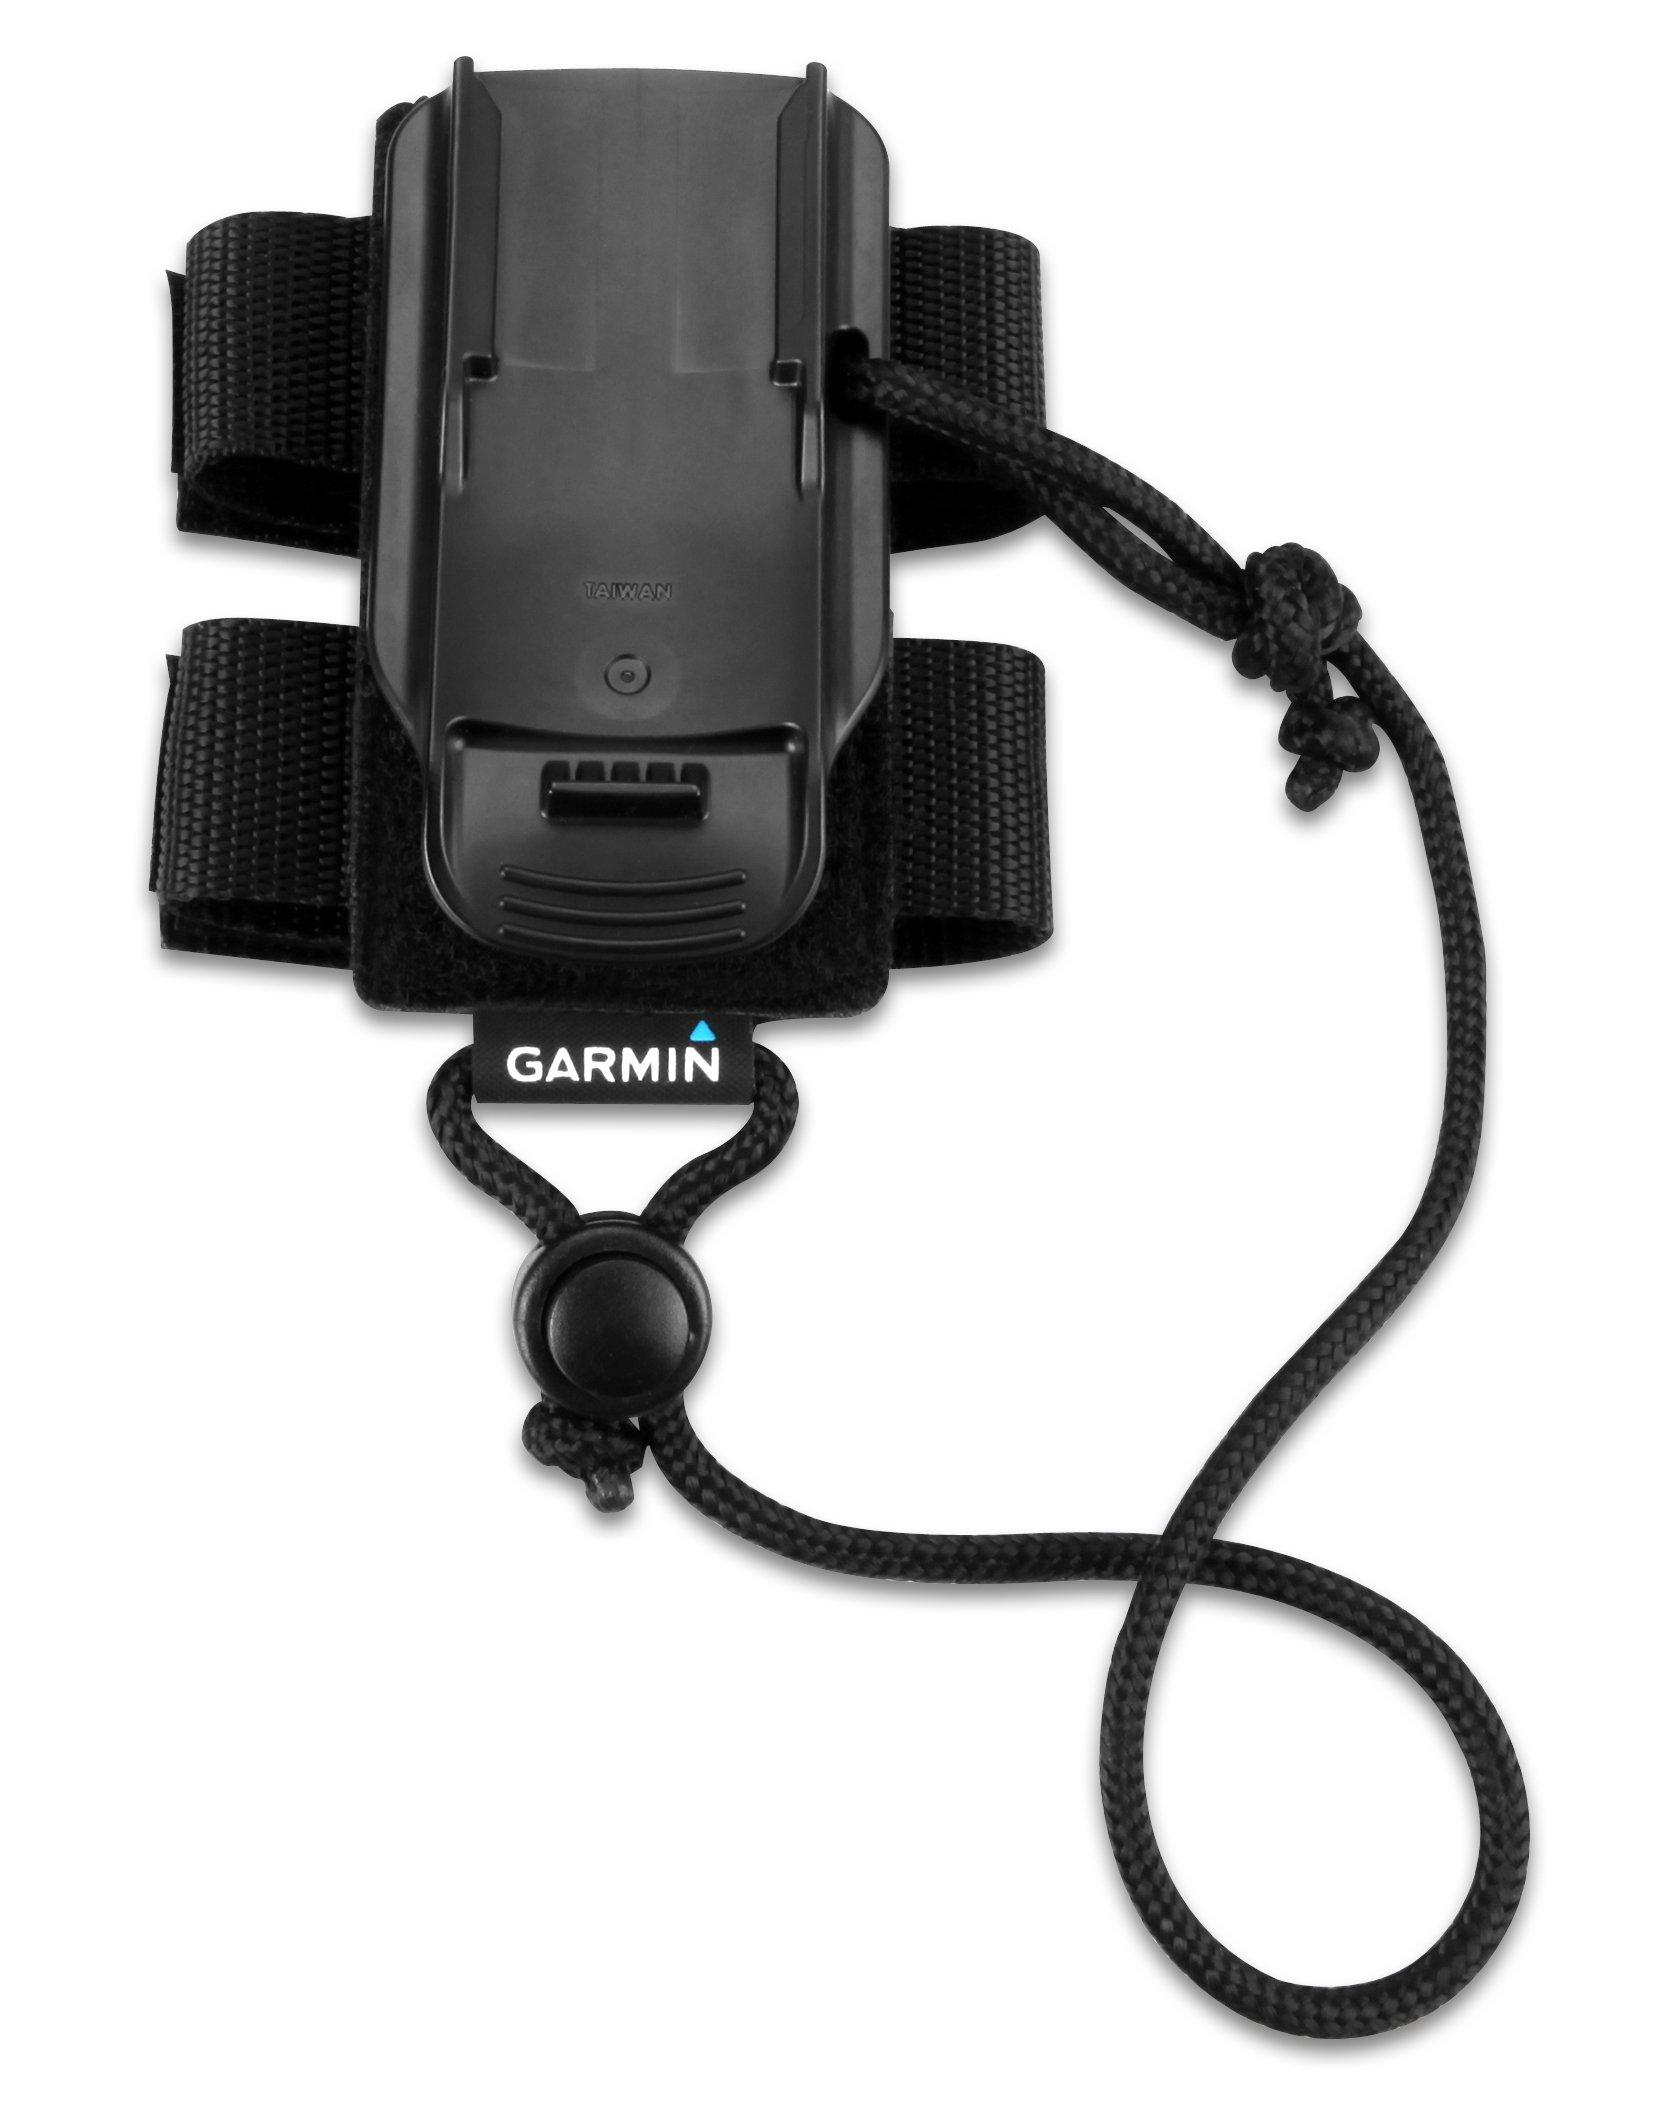 Garmin  Backpack Tether Accessory for Garmin Devices by Garmin